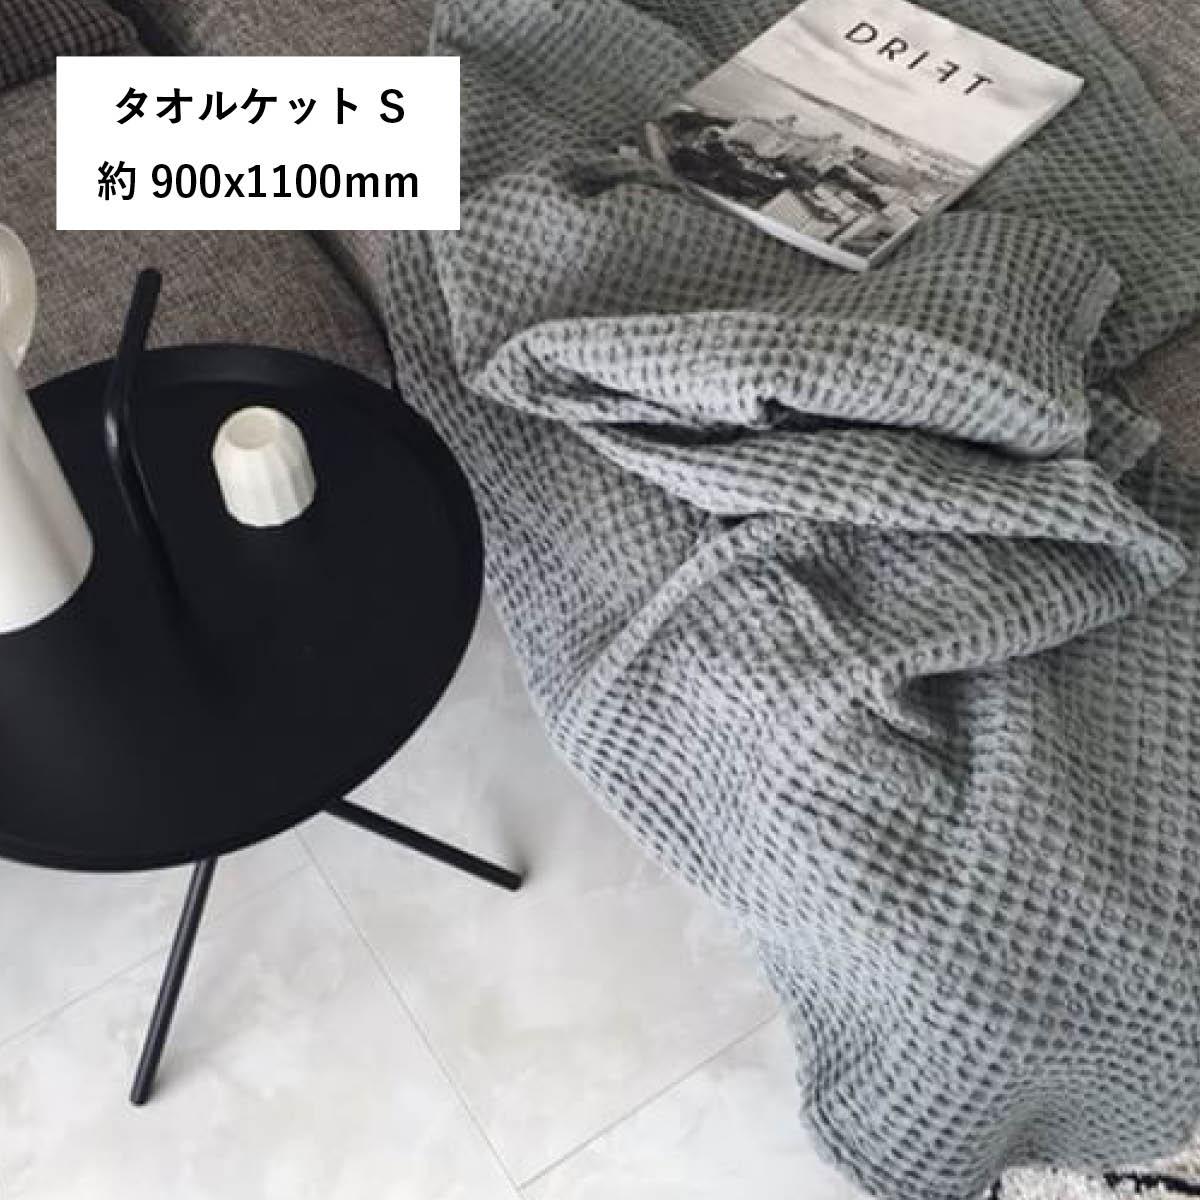 [b2cオーガニックコットン ワッフル タオルケット S] 洗える寝具 丸洗いOK 吸汗速乾 タオルケット 無地 シングルサイズ 寝具 日本製